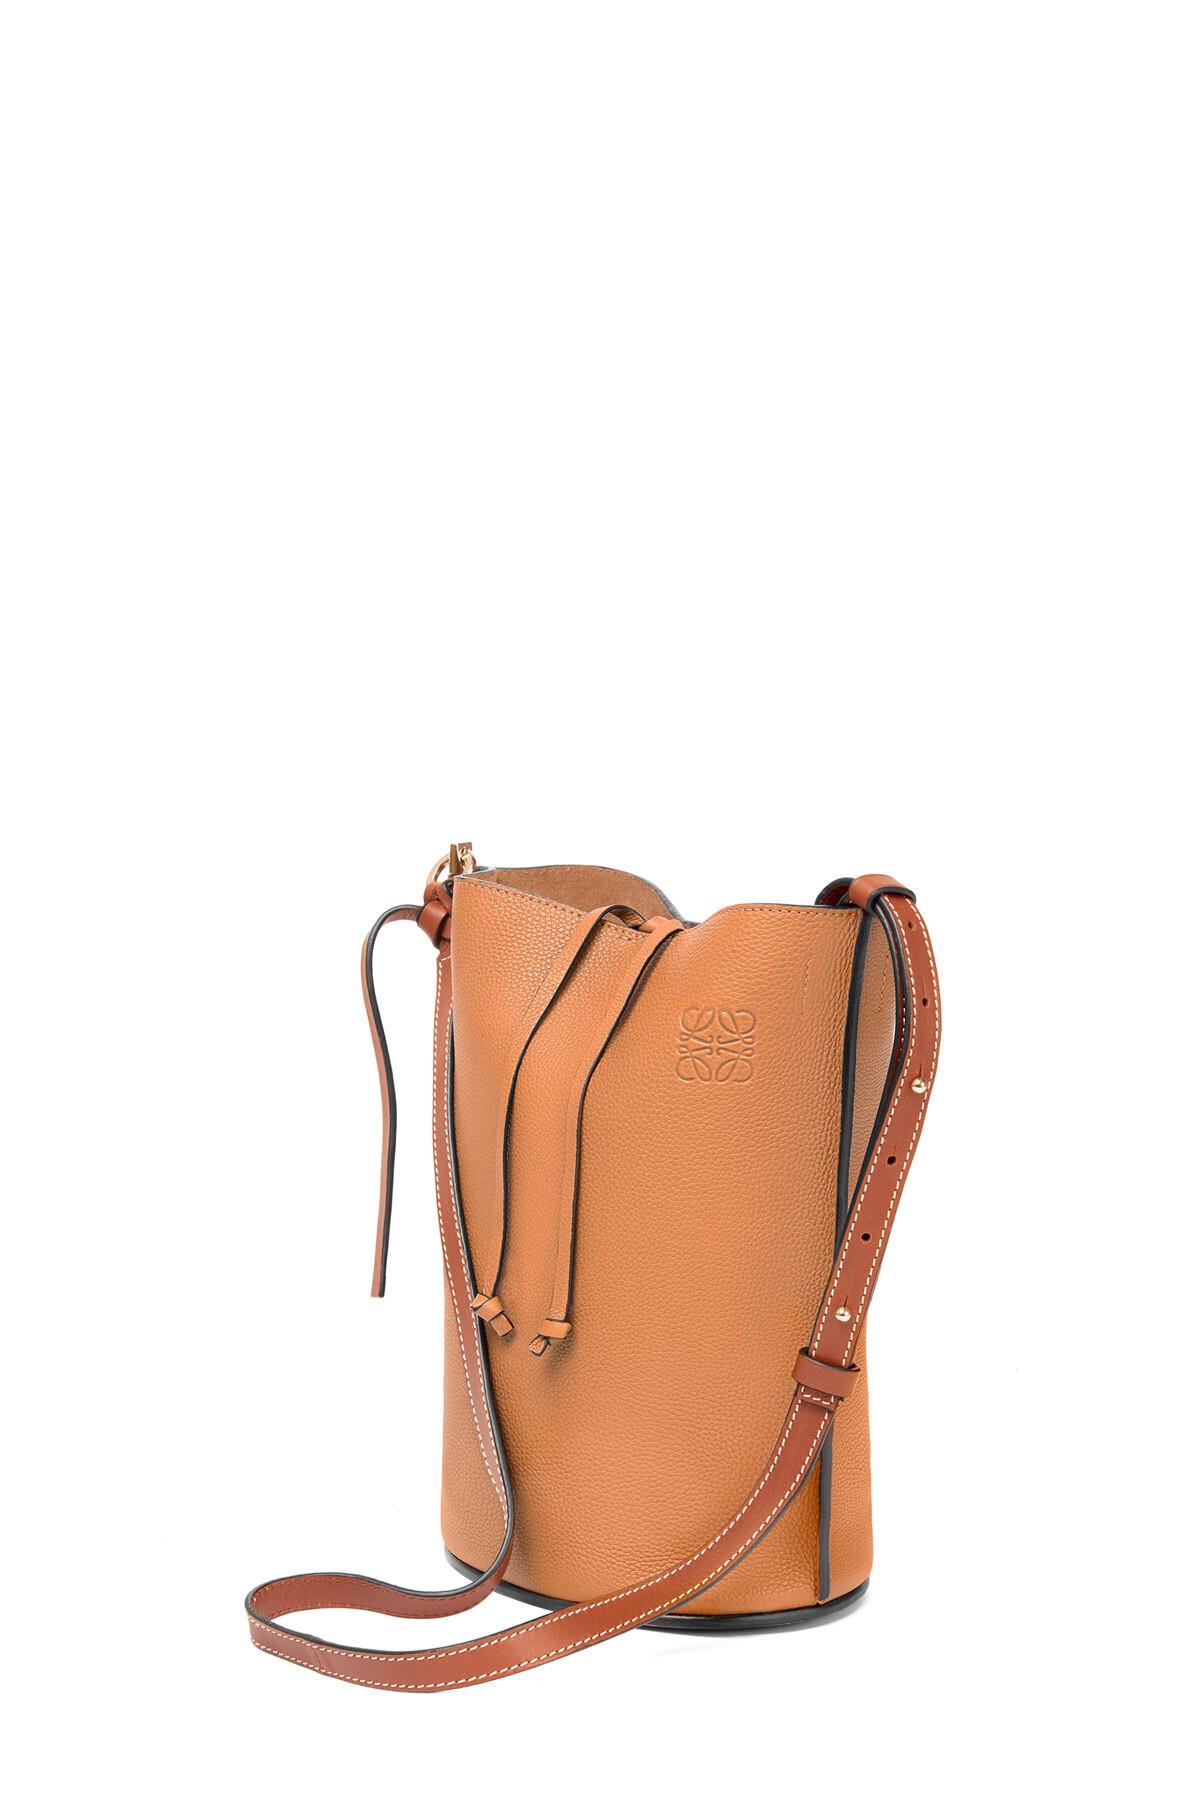 LOEWE Gate Bucket Bag Light Caramel/Pecan Color  front